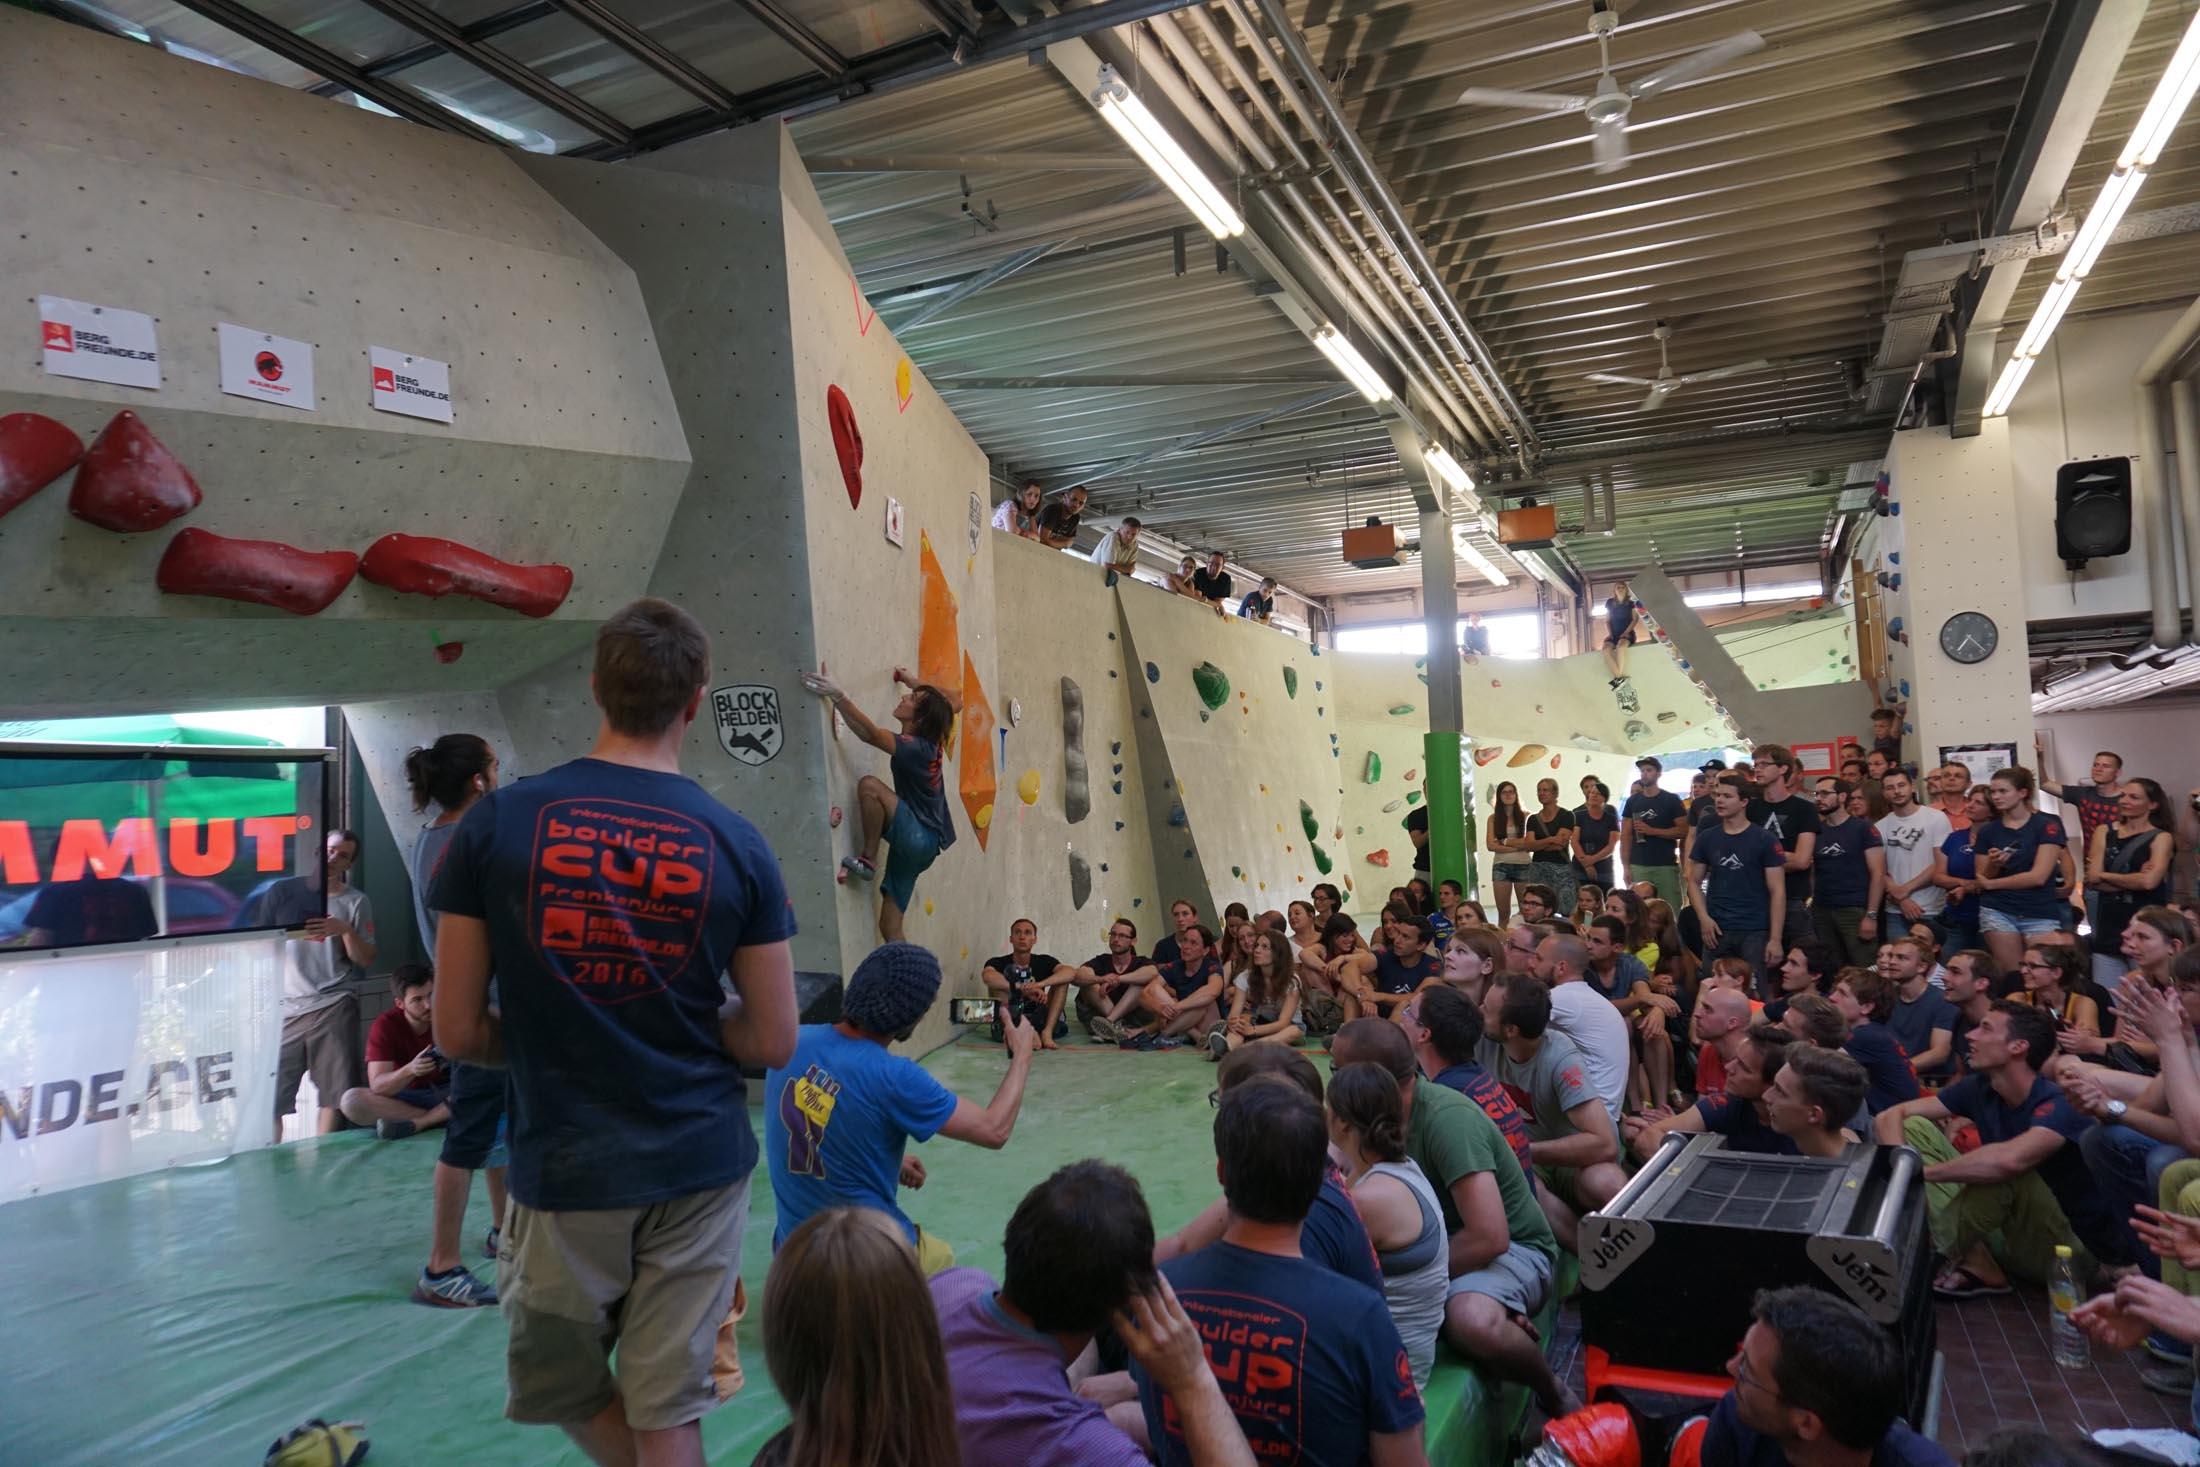 Finale, internationaler bouldercup Frankenjura 2016, BLOCKHELDEN Erlangen, Mammut, Bergfreunde.de, Boulderwettkampf07092016619